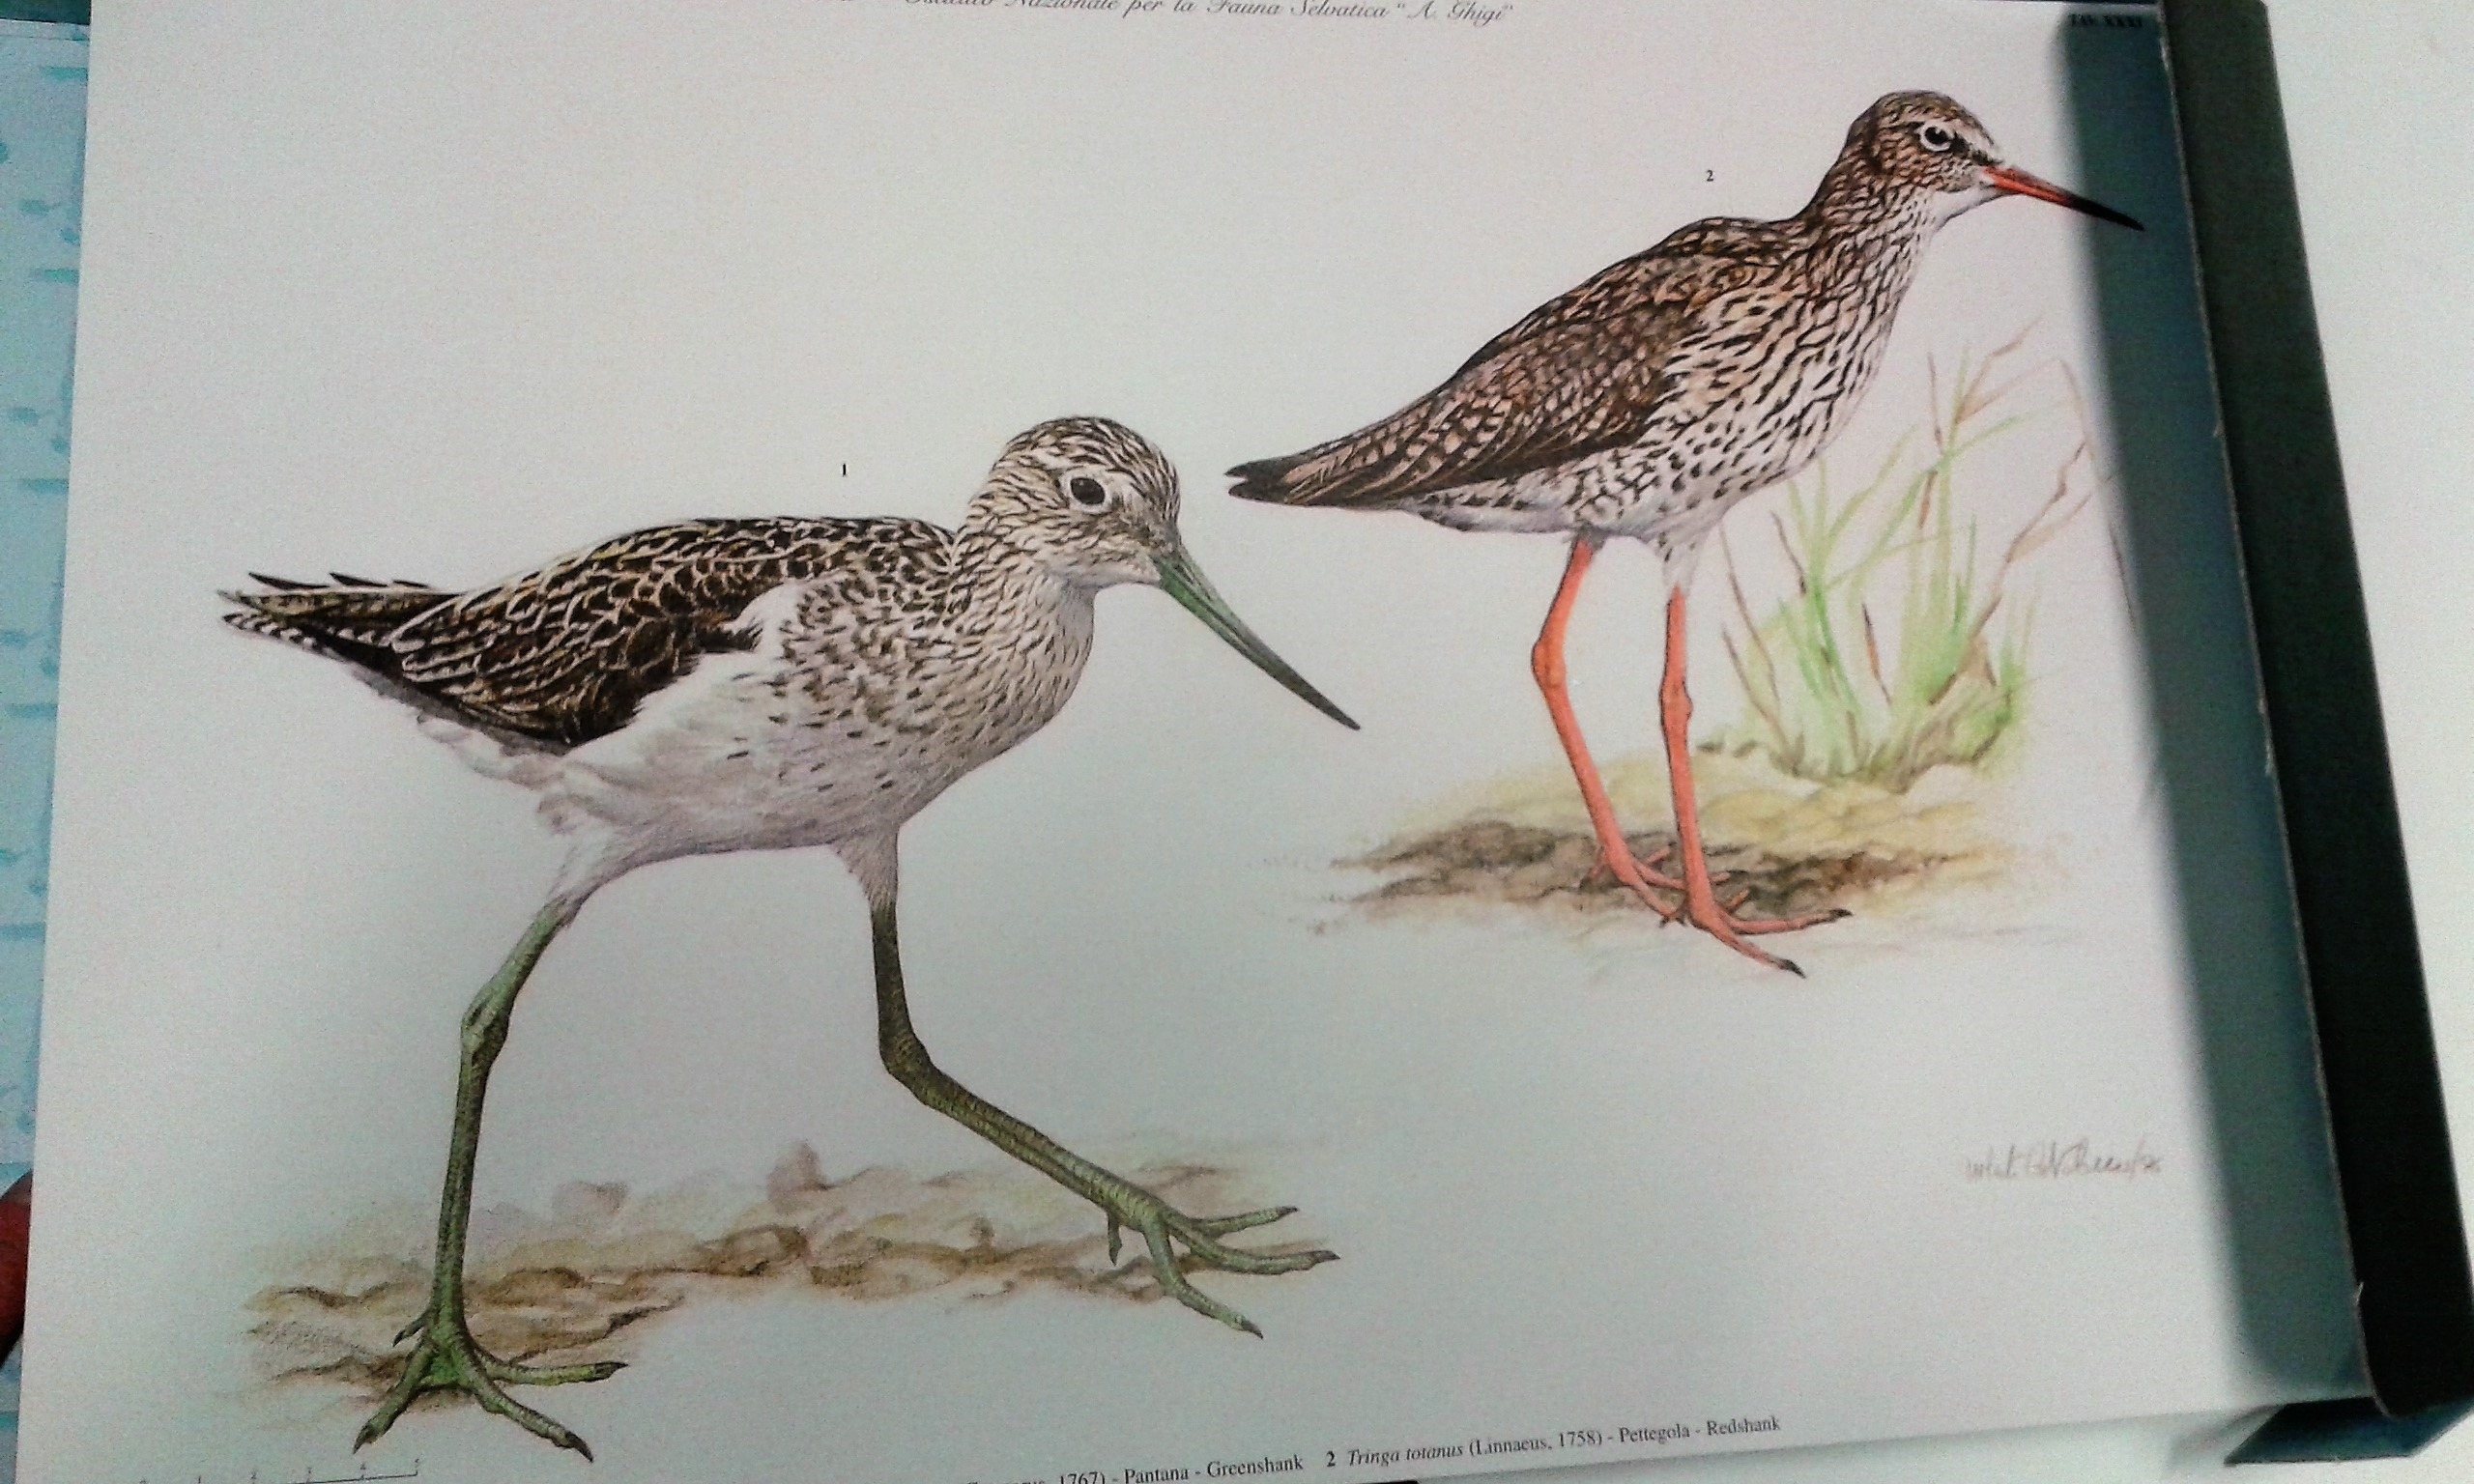 Iconografia degli uccelli ditalia vol. iii iconography of